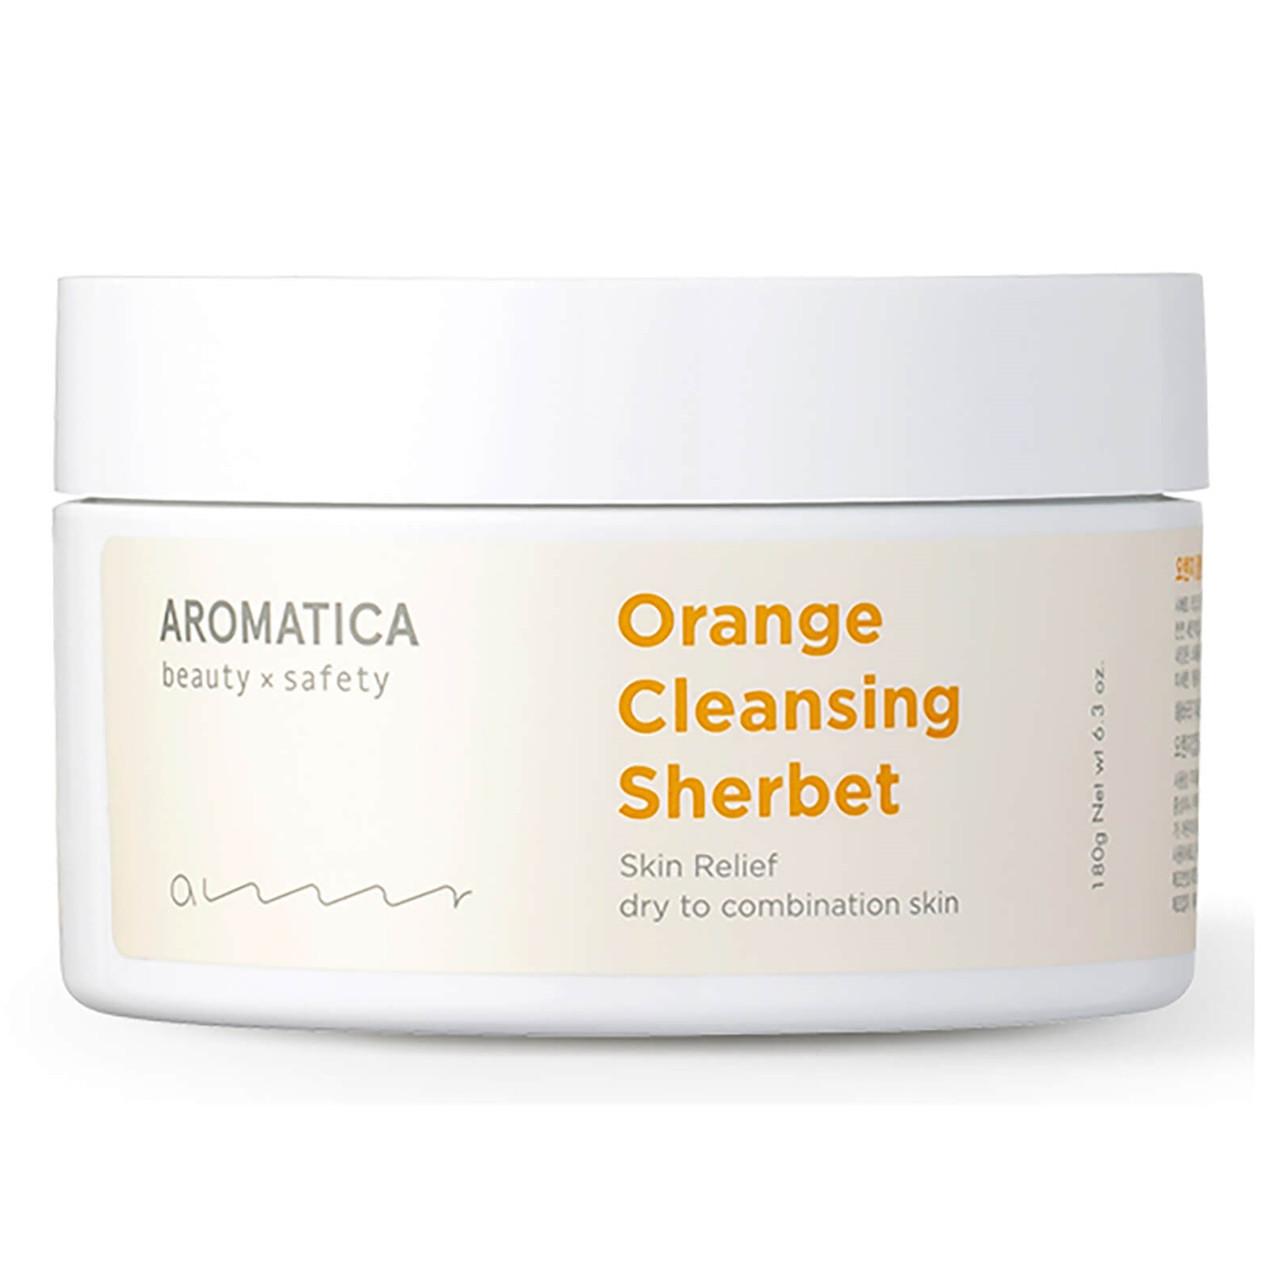 Aromatica Orange Cleansing Sherbet Очищающий щербет